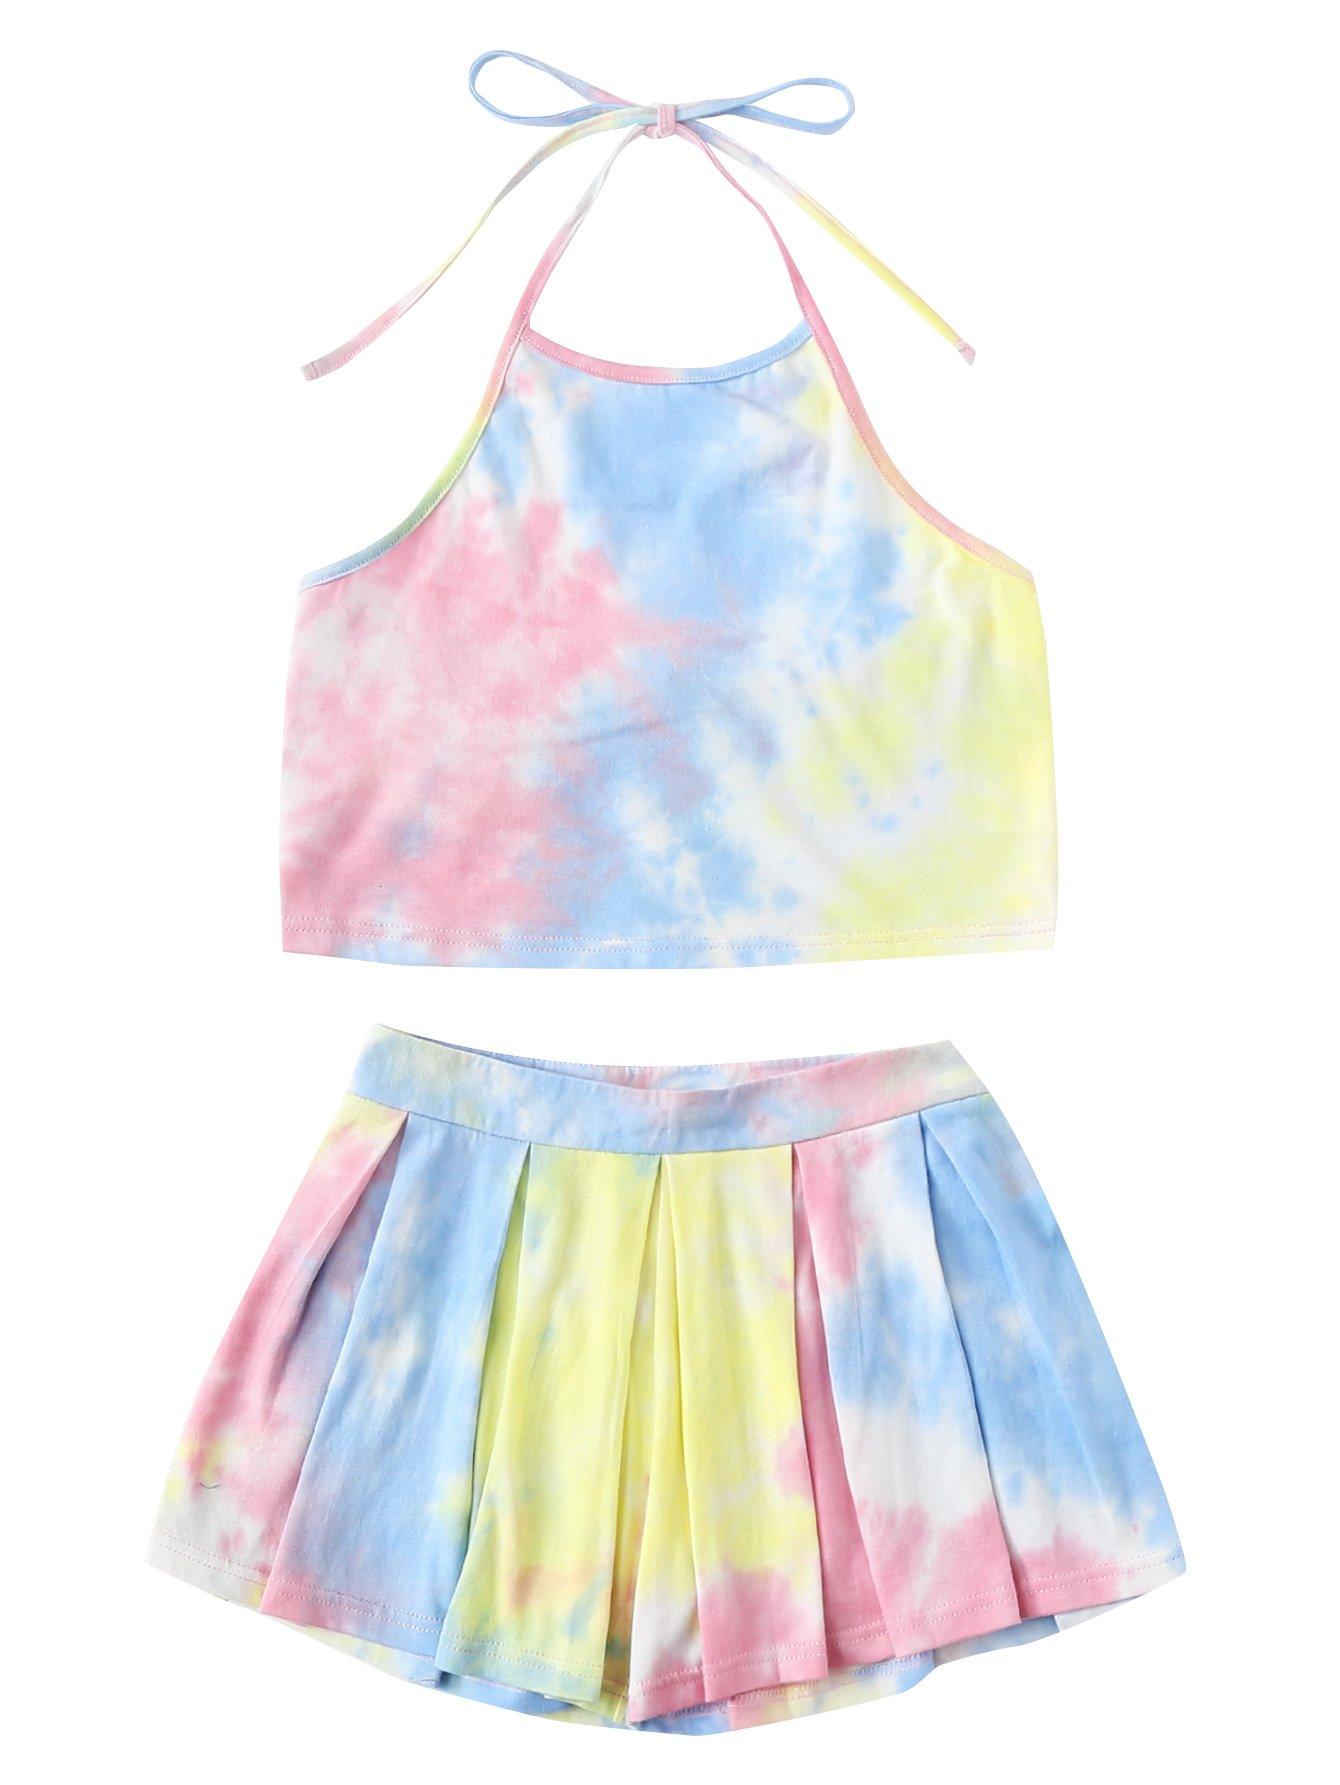 SweatyRocks Women's 2 Piece Set Halter Crop Top and Shorts Set Tie Dye#5 M